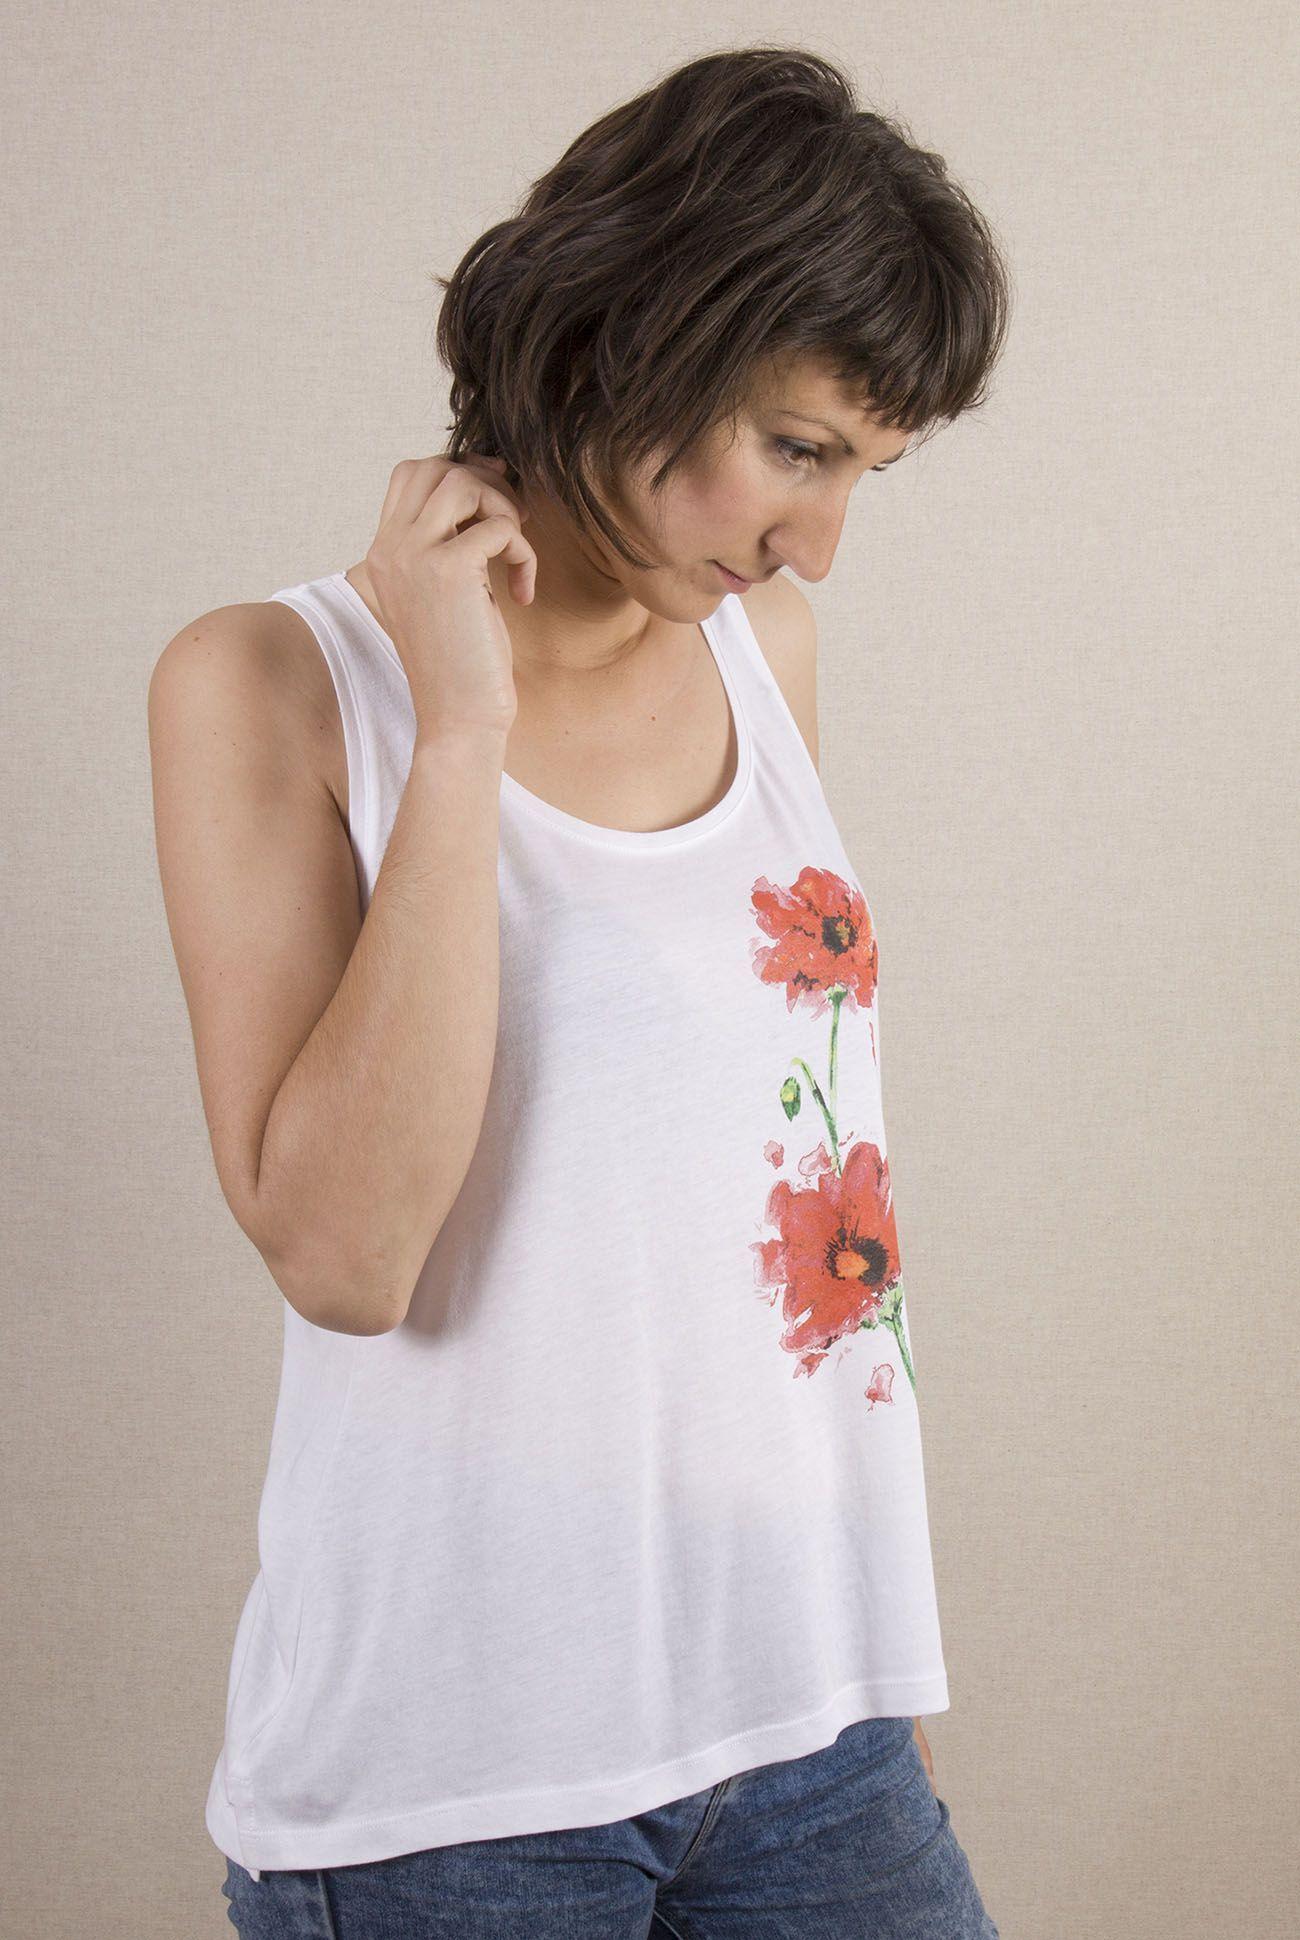 camiseta-ecologica-algodon organico-tencel-amapolas-mujer-blanca-tirantes-sirem wild